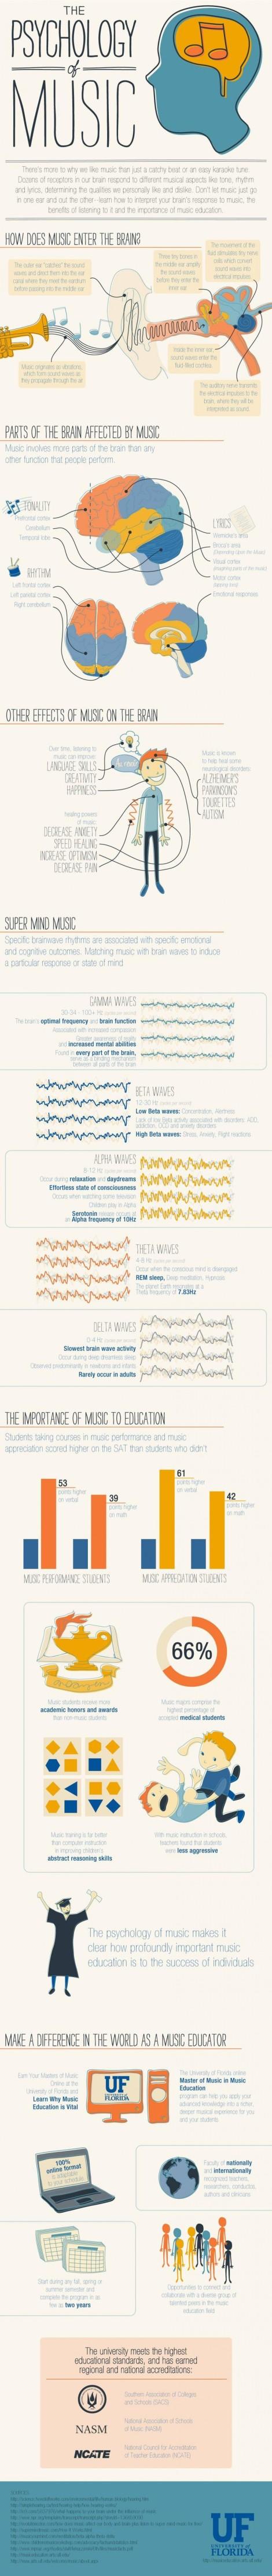 the-psychology-of-music_510e25927e035_w1500